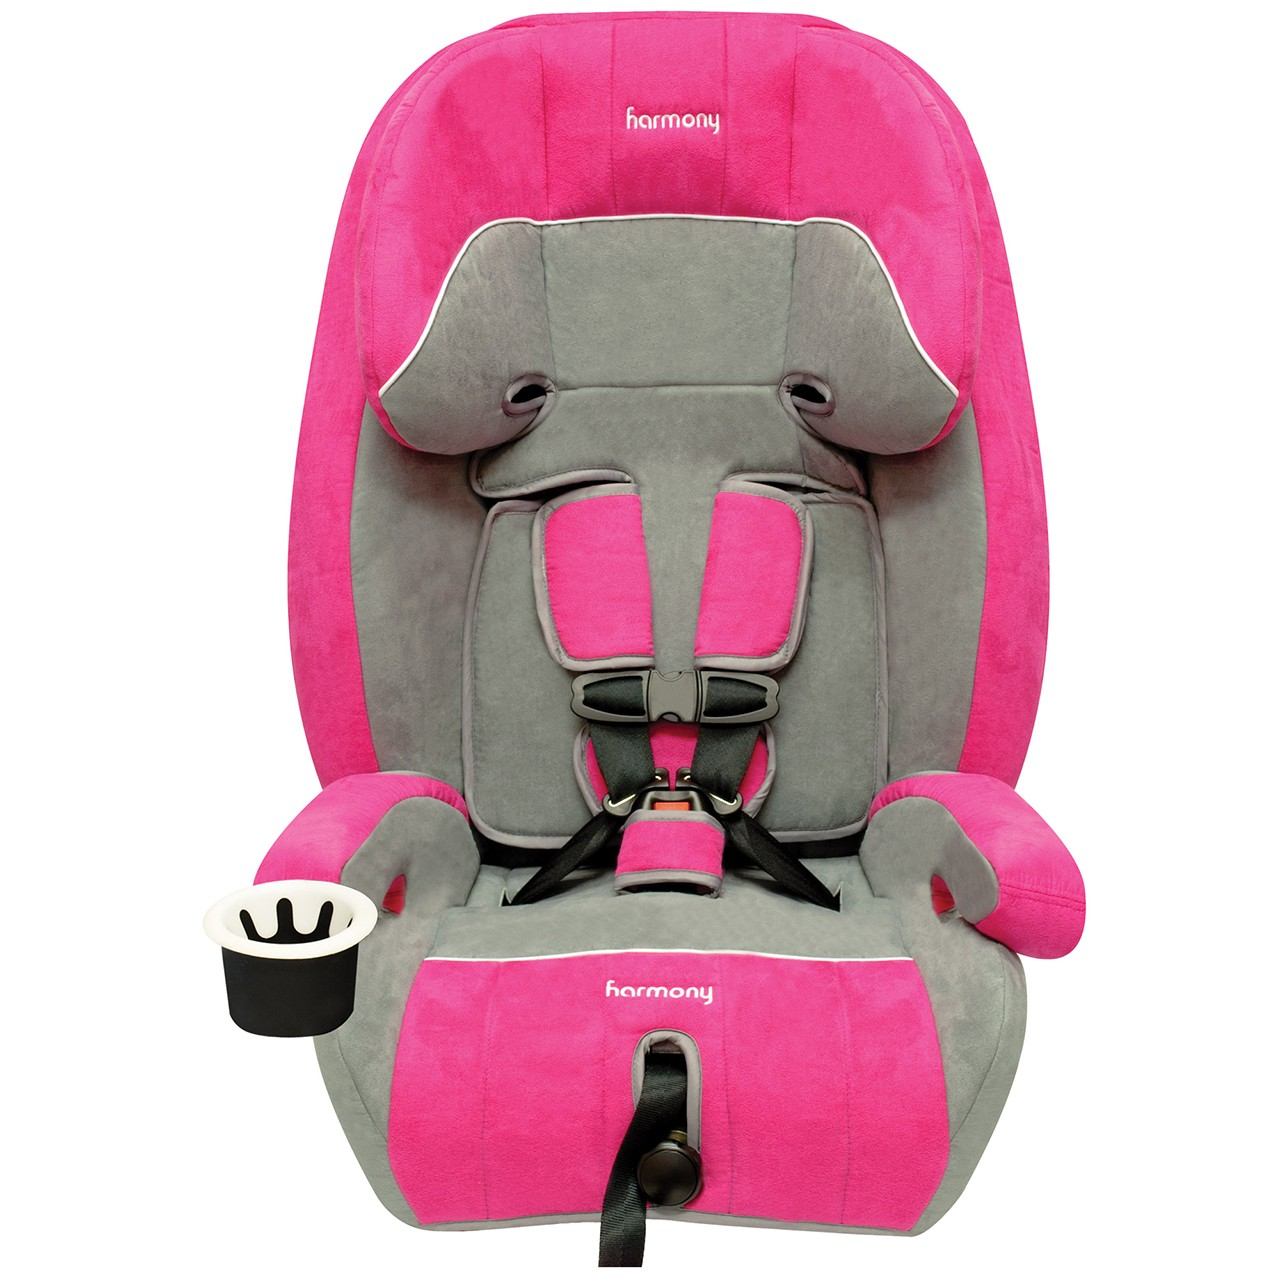 Defender 360° 3-in-1 Combination Deluxe Car Seat - Raspberry